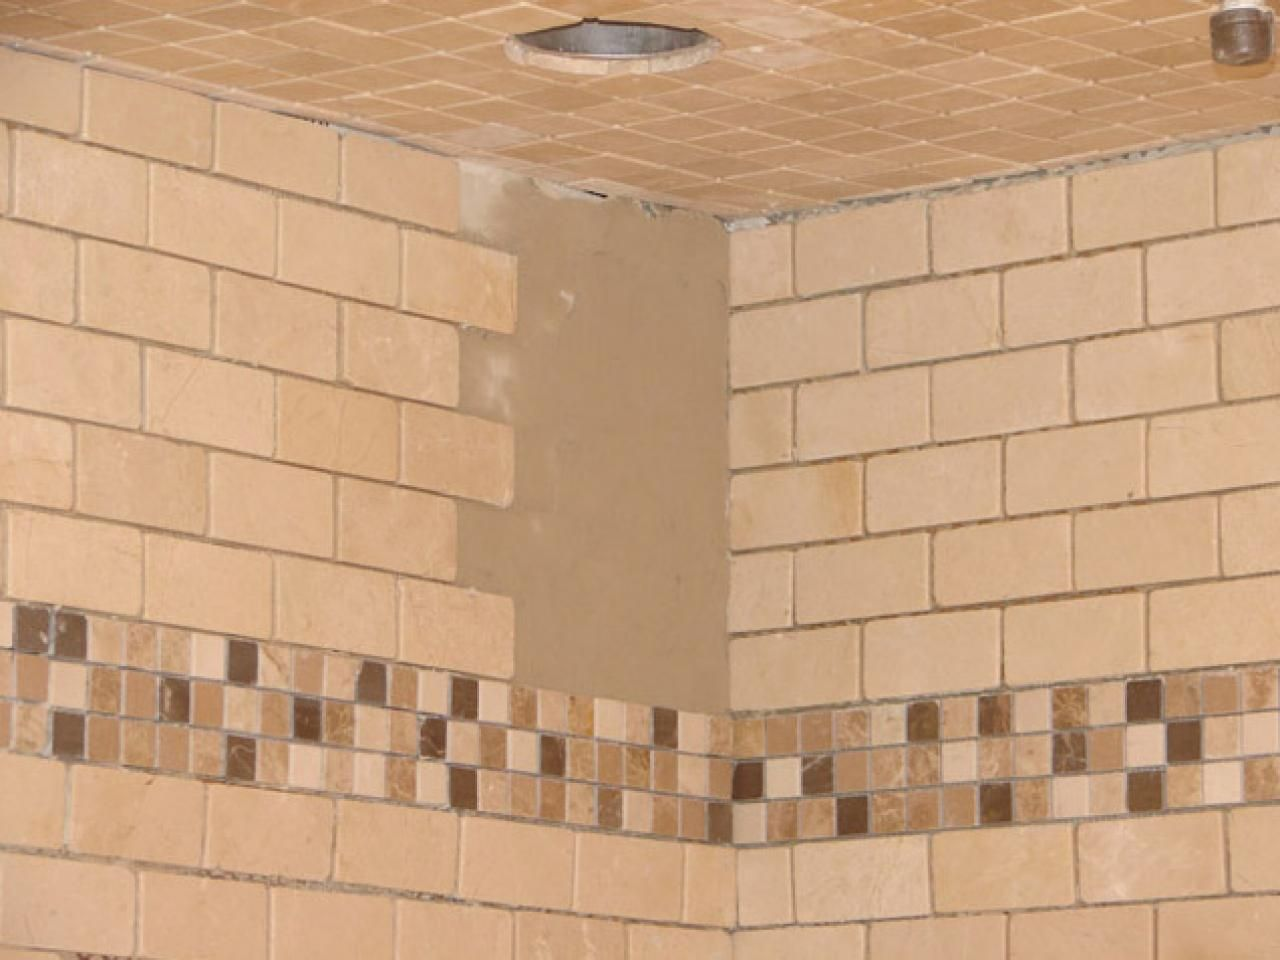 How to Install Tile in a Bathroom Shower | Bathroom tile ...